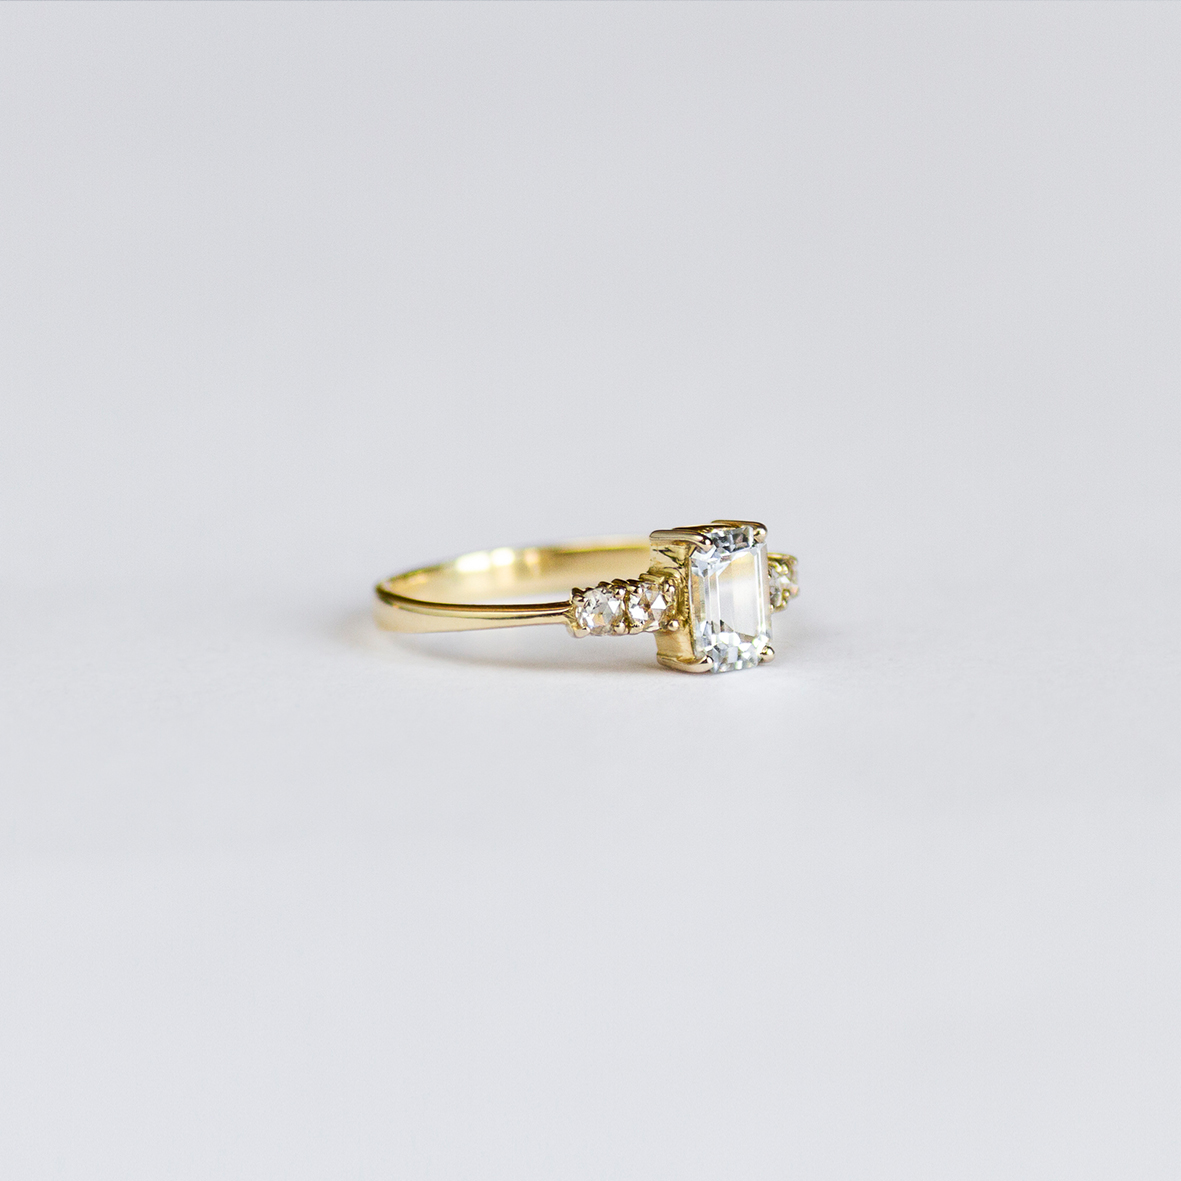 2. OONA_engagement_ficha2_single sapphire with diamonds ring